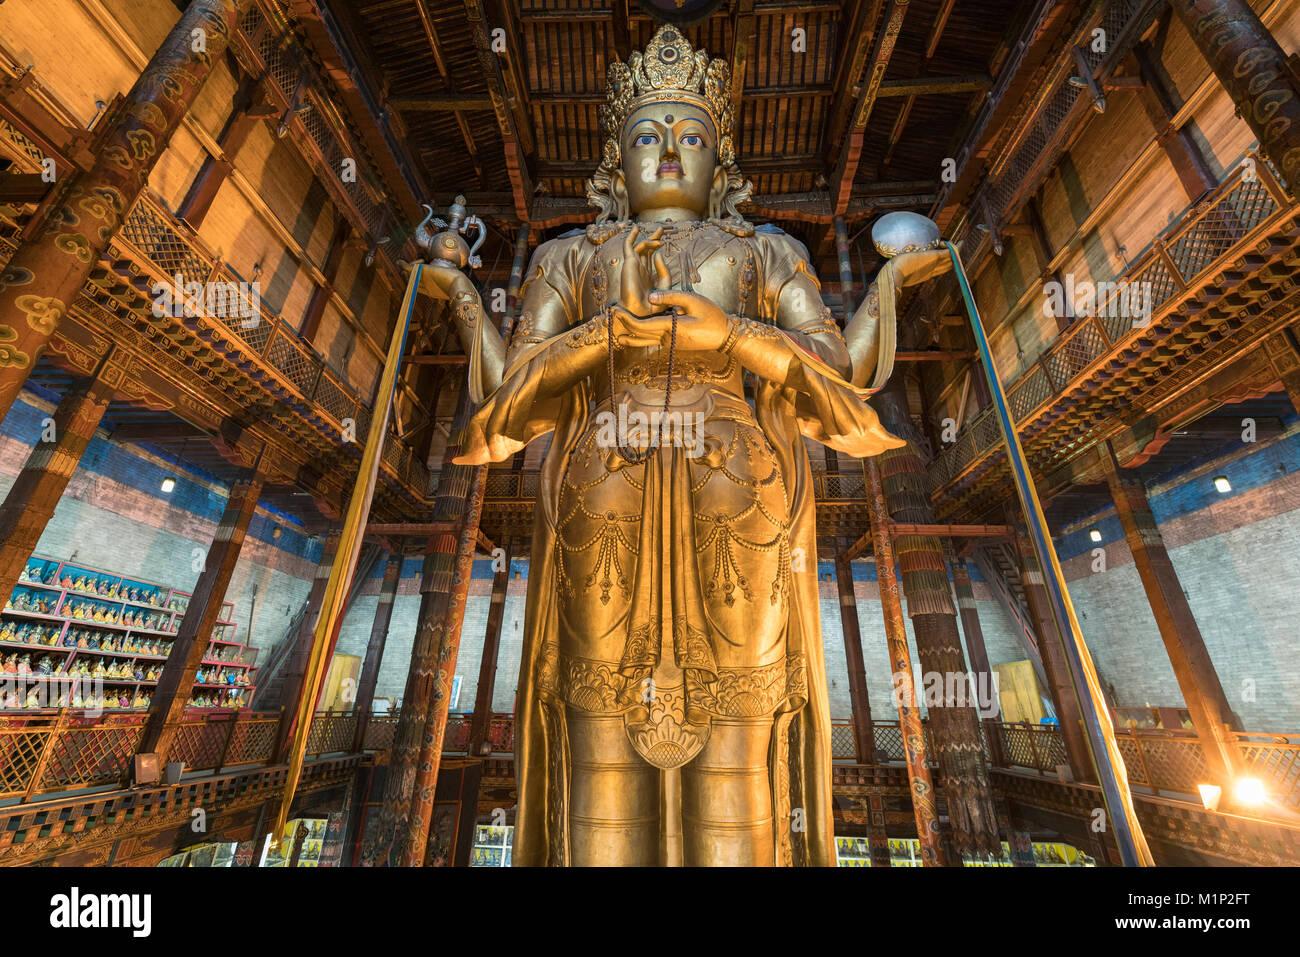 Avalokitesvara Statue im Gandan Kloster in Ulan Bator, Mongolei, Zentralasien, Asien Stockbild